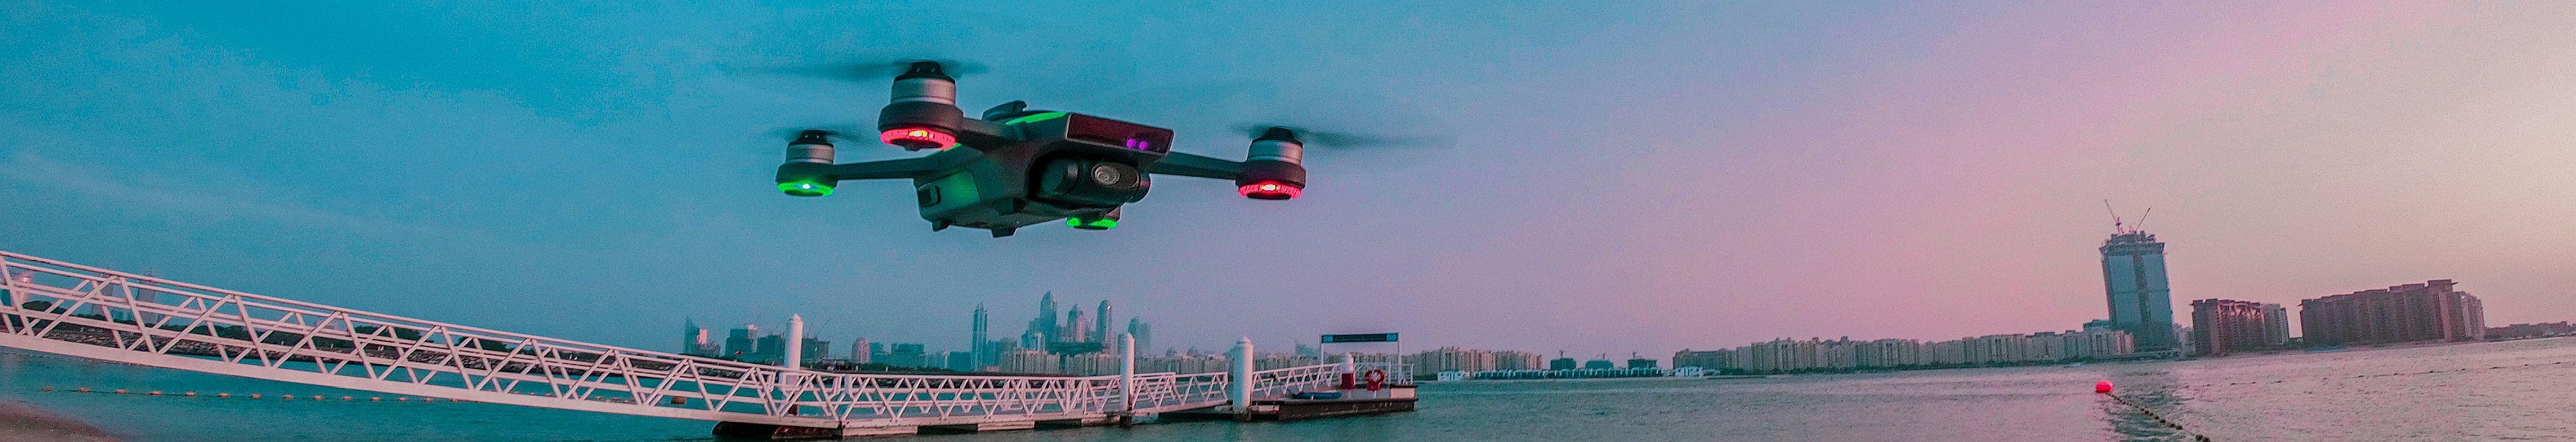 drones-detection